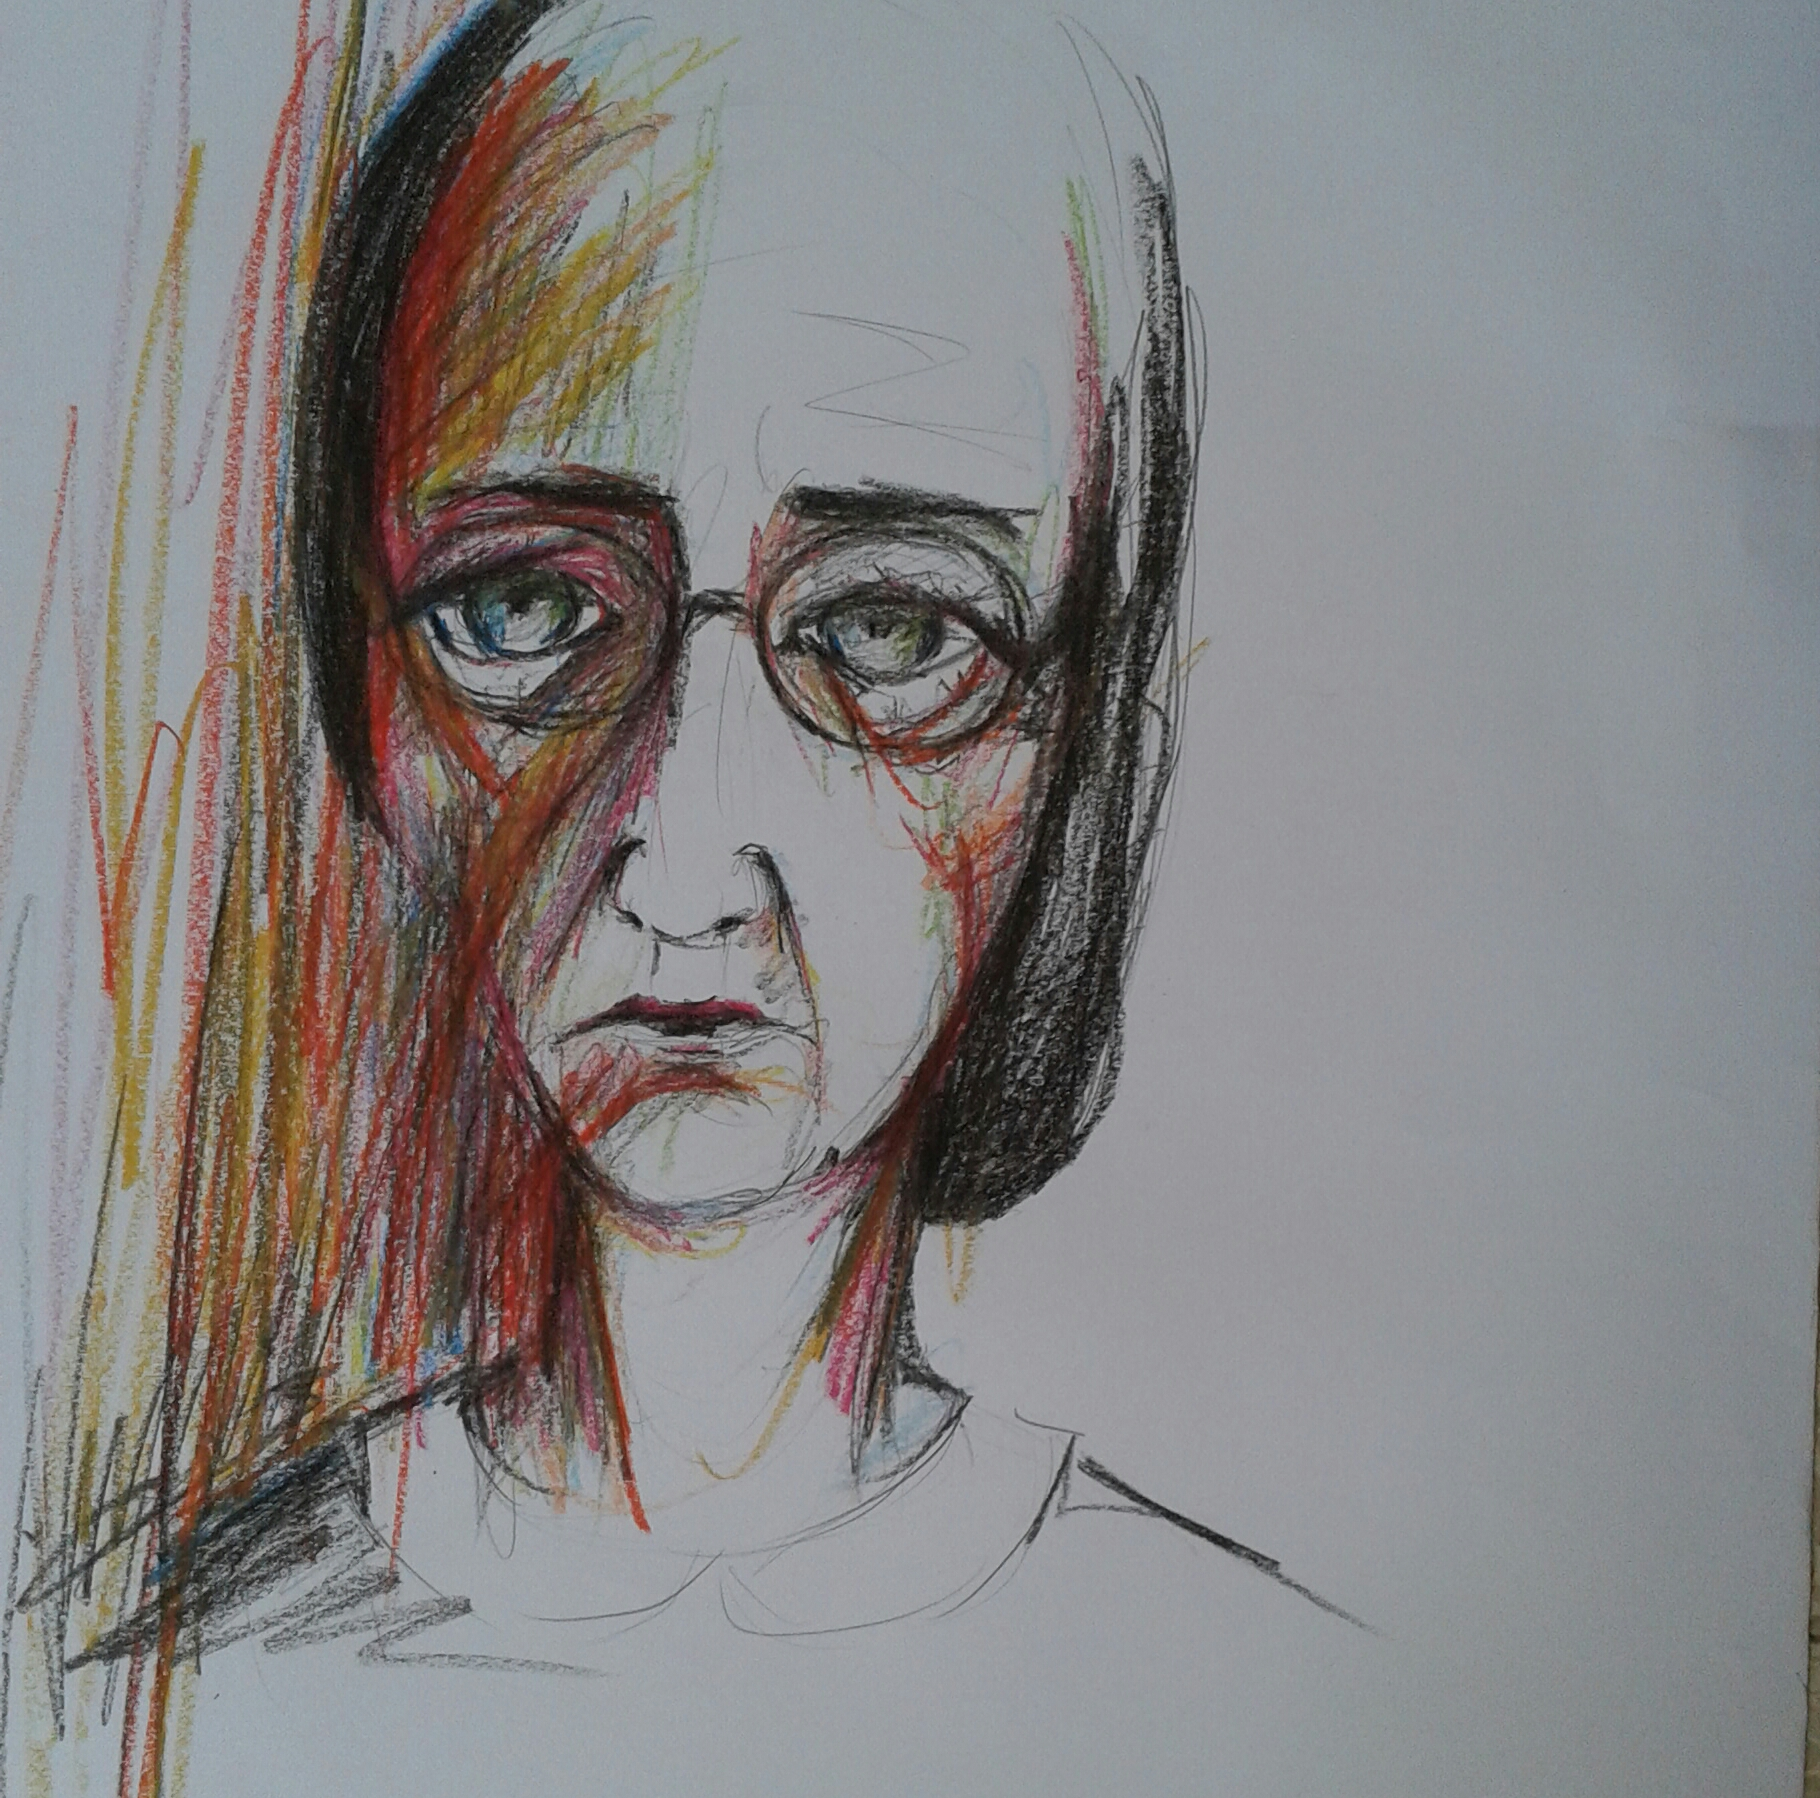 Artwork from the book - שירים ורישומים – ציפורה בראבי by tsipi baravi - Illustrated by ציפורה בראבי - Ourboox.com